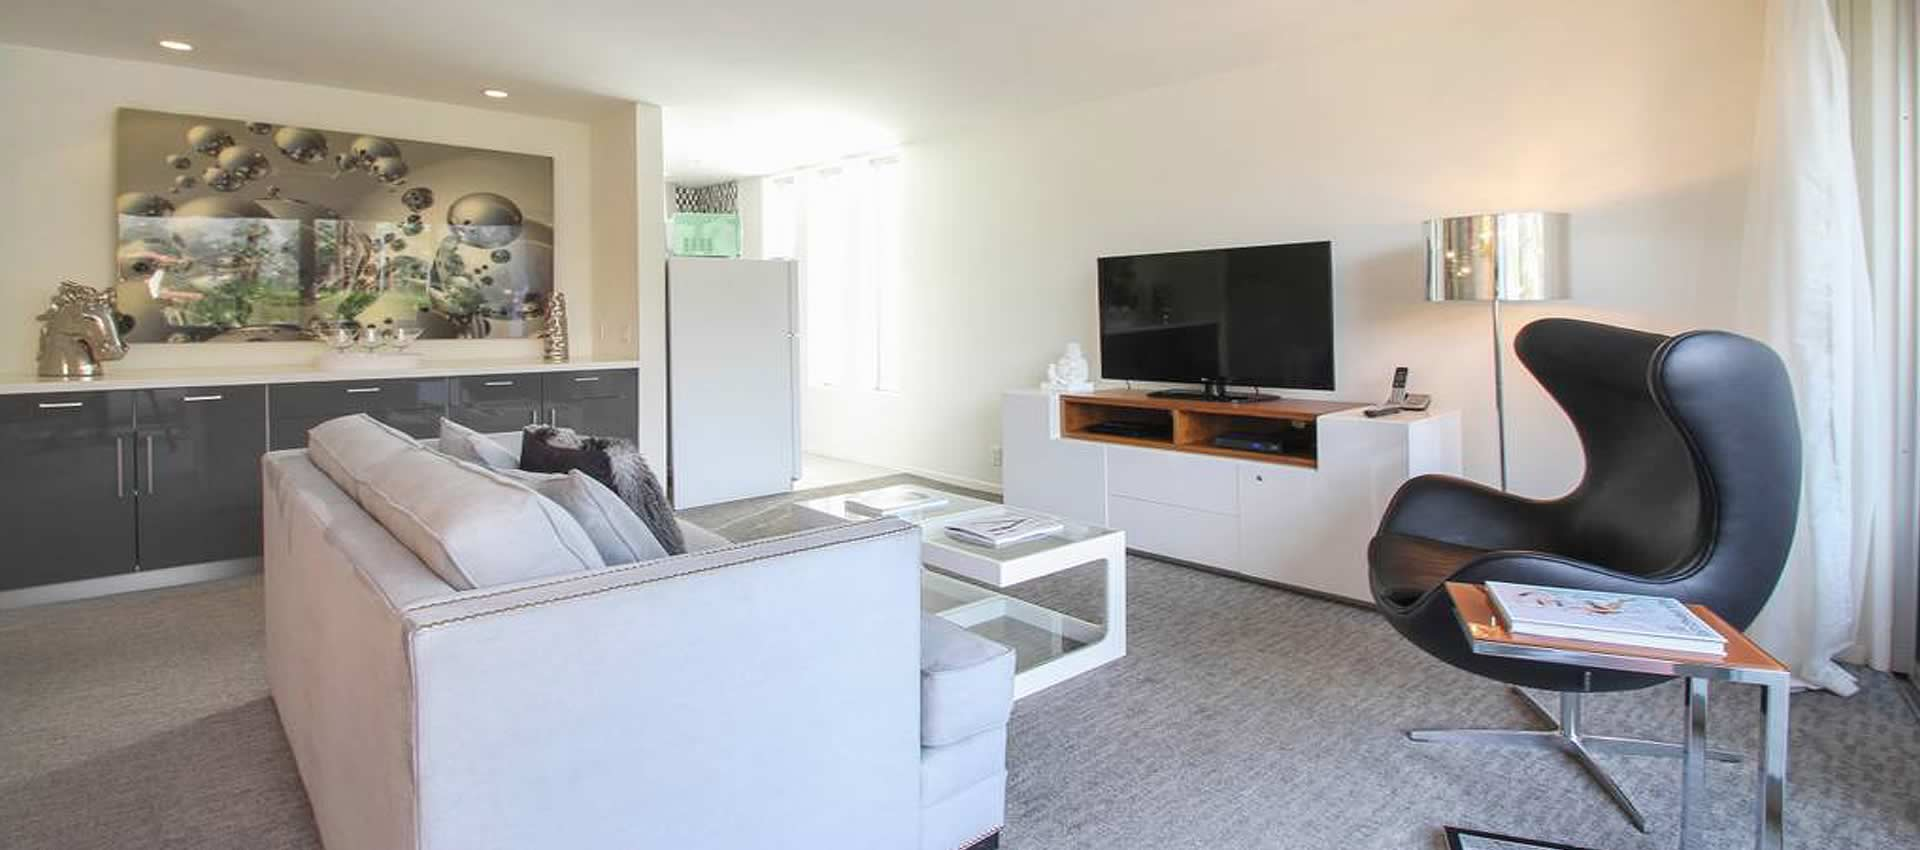 the living room twist hotel room 203